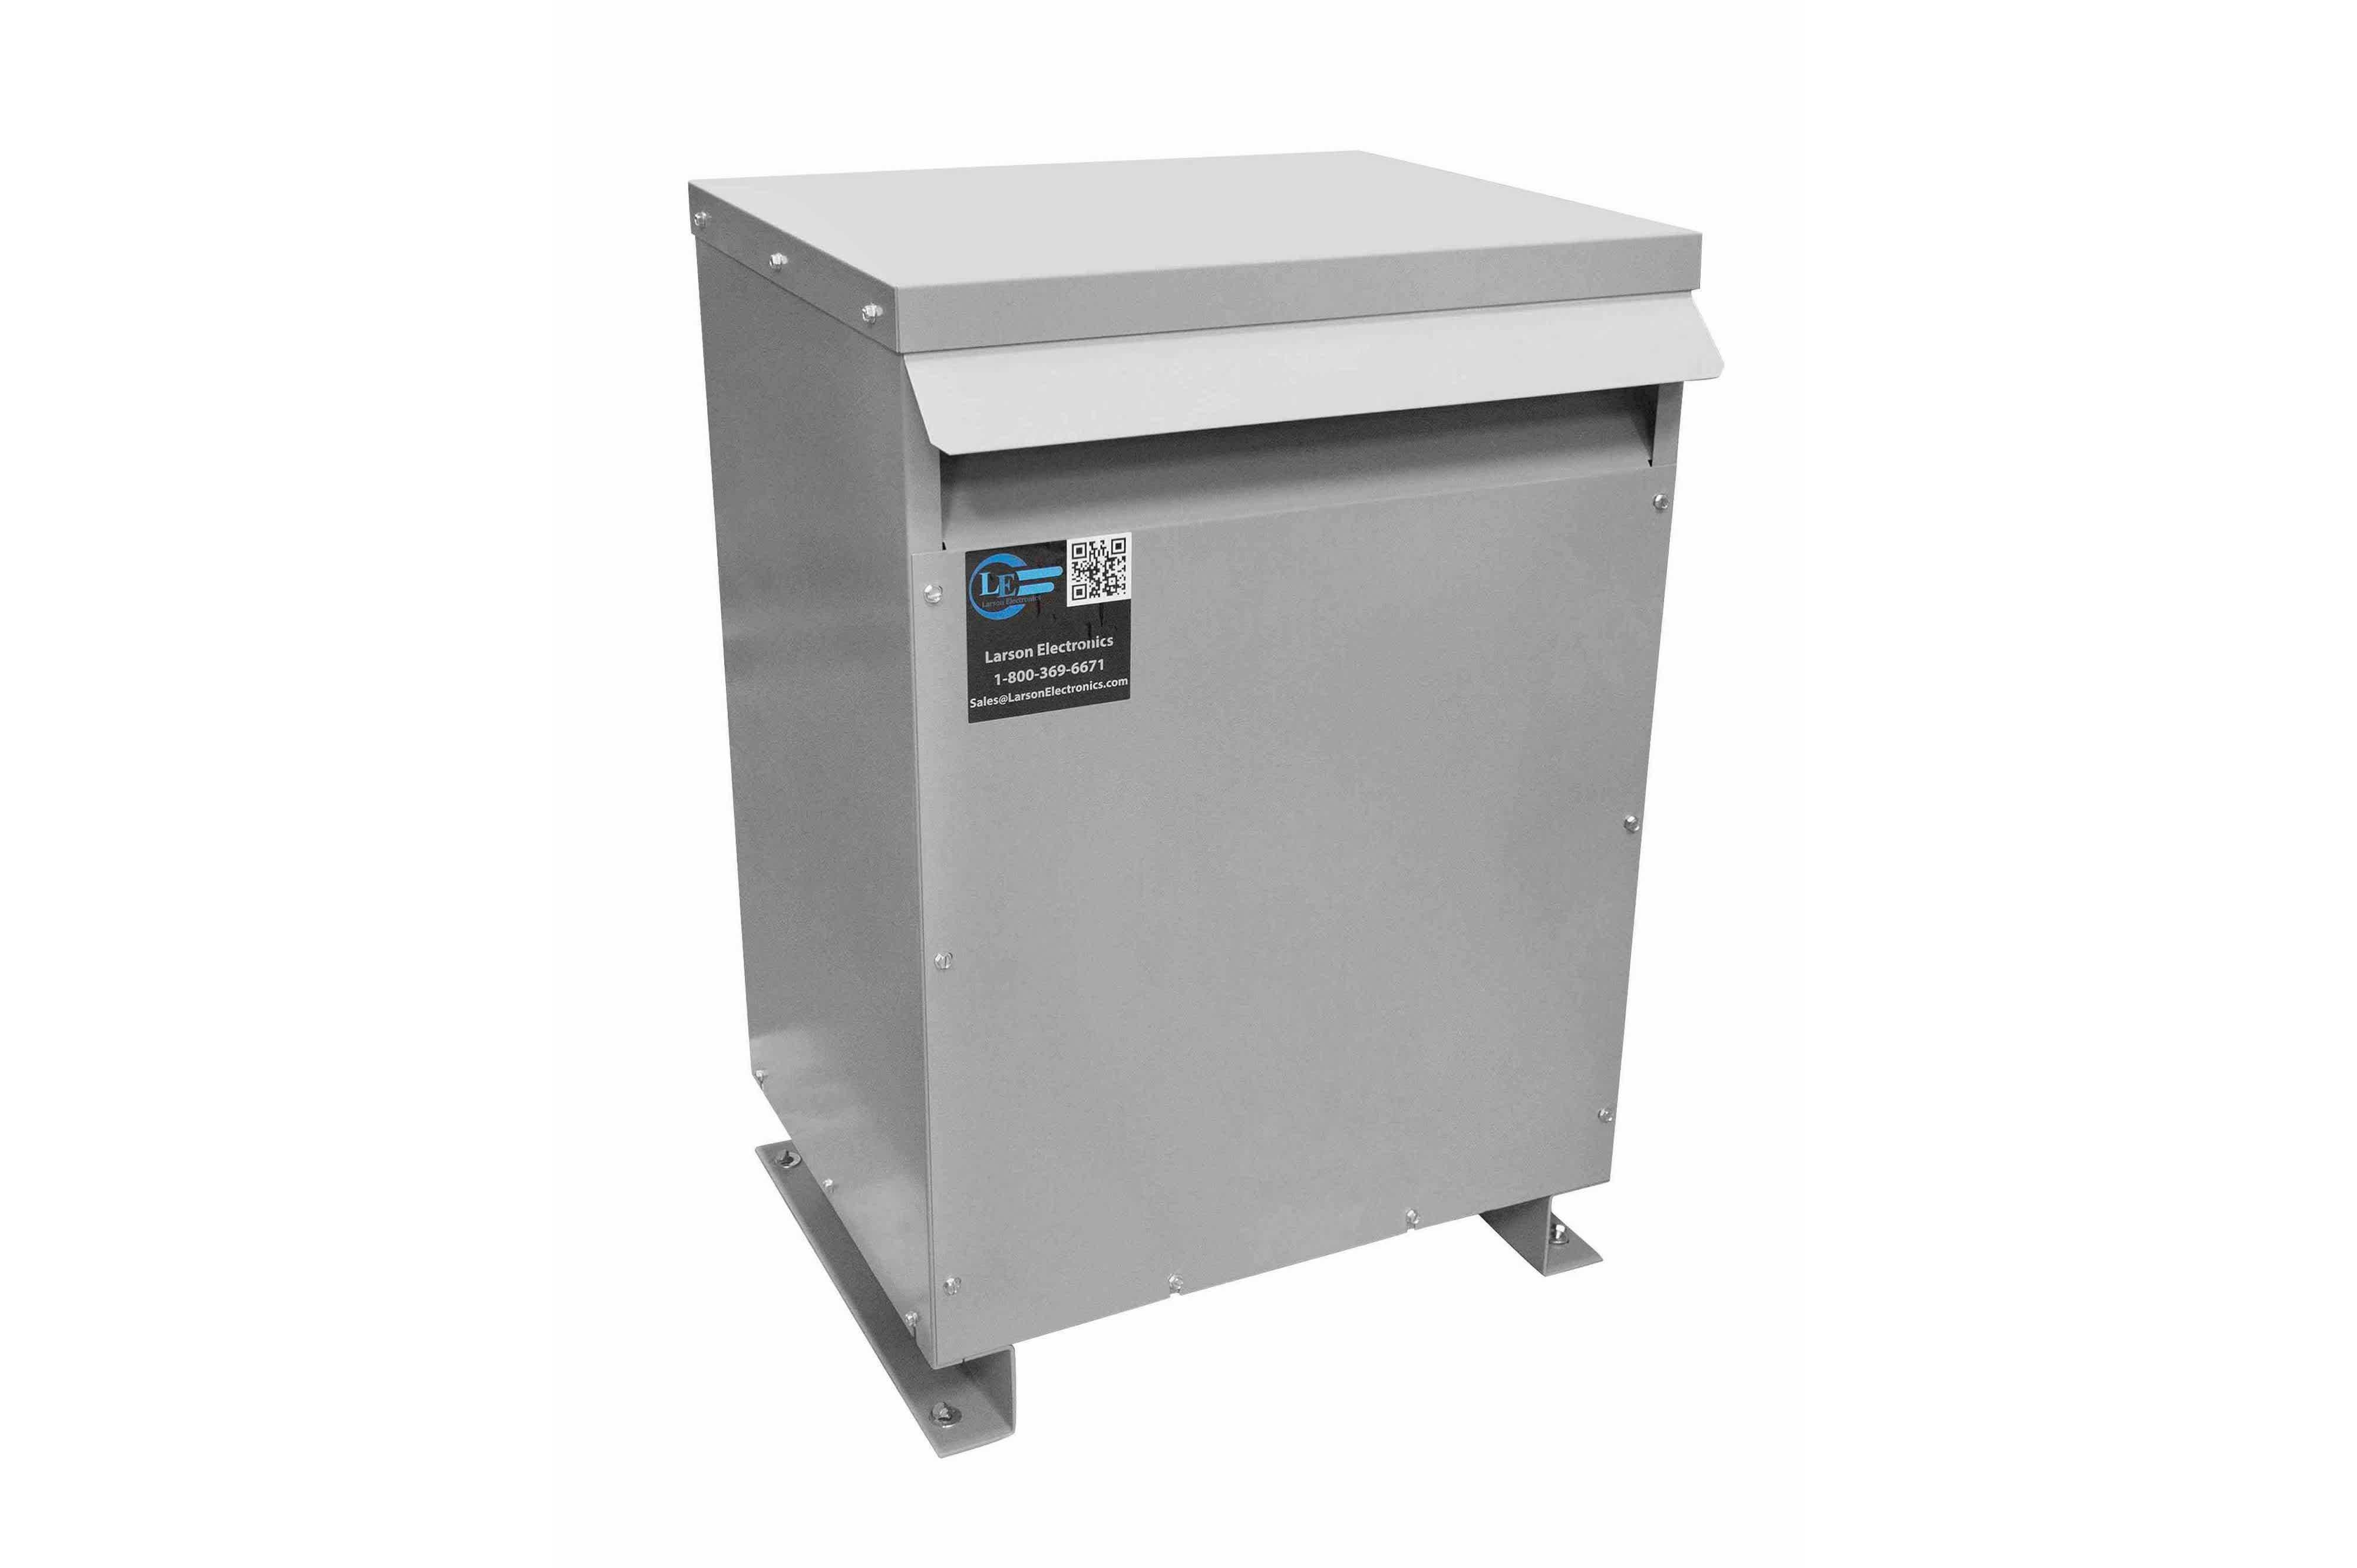 400 kVA 3PH DOE Transformer, 240V Delta Primary, 415Y/240 Wye-N Secondary, N3R, Ventilated, 60 Hz